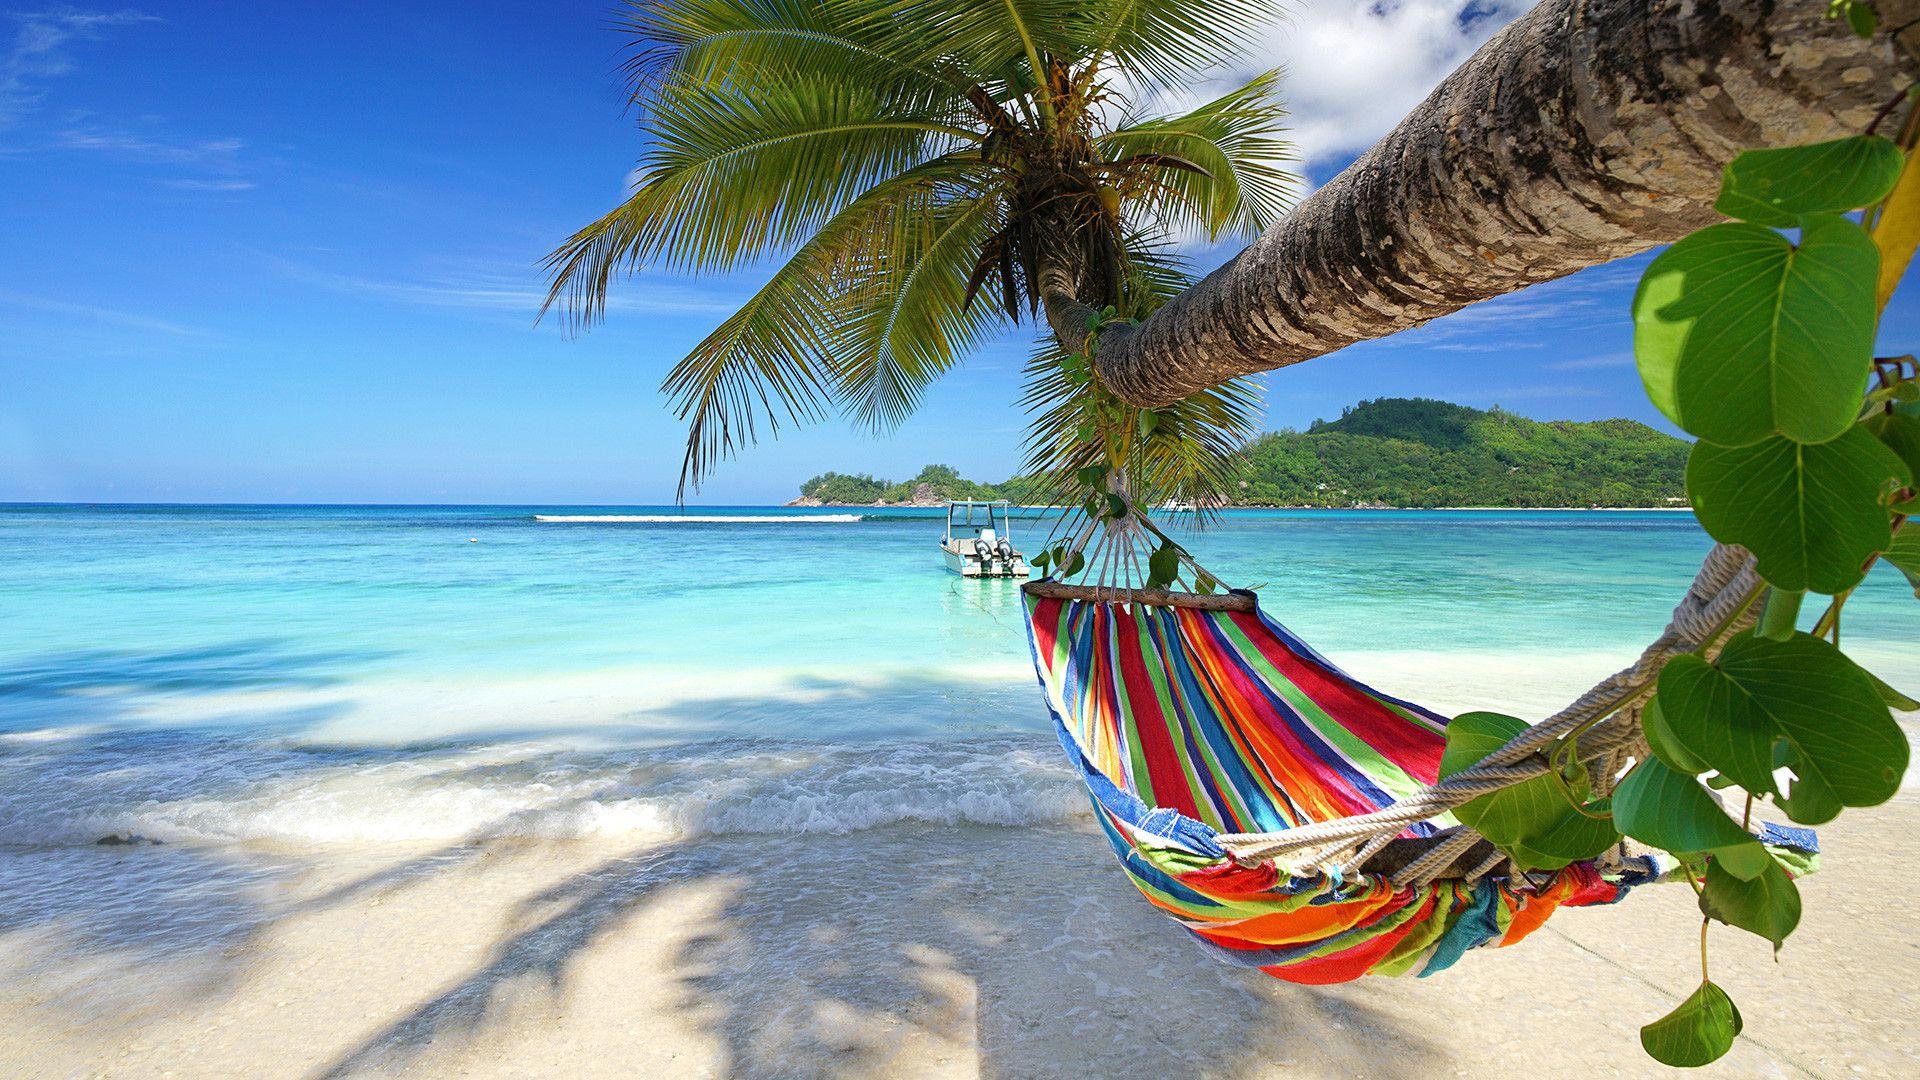 Sejur plaja Mahe, Seychelles, 9 zile - august 2021